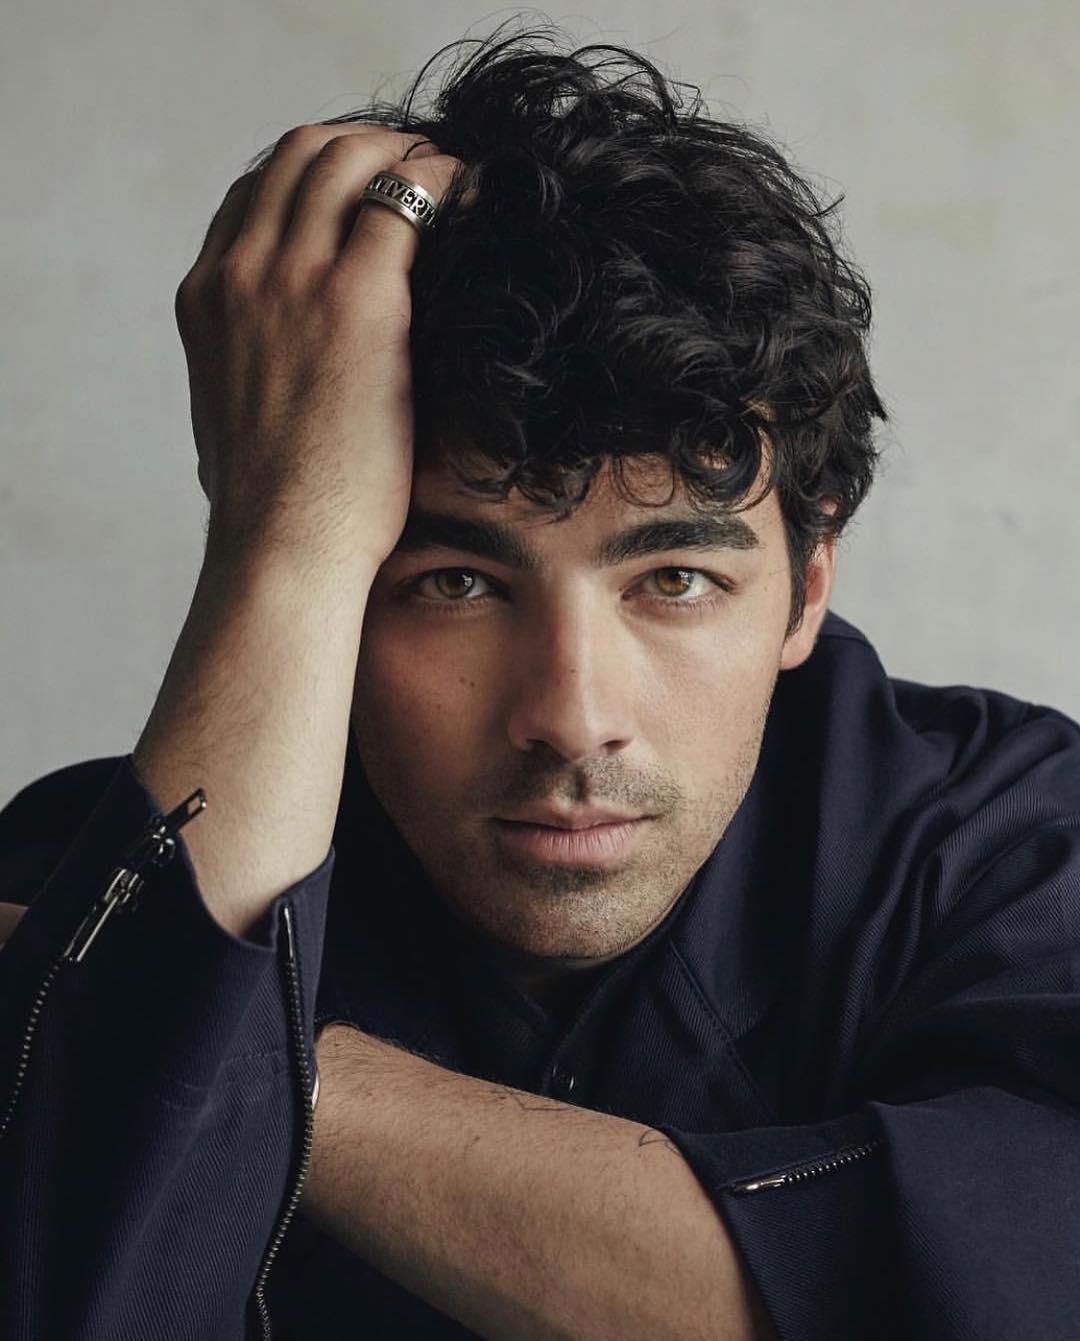 Joe Jonas' potrait picture